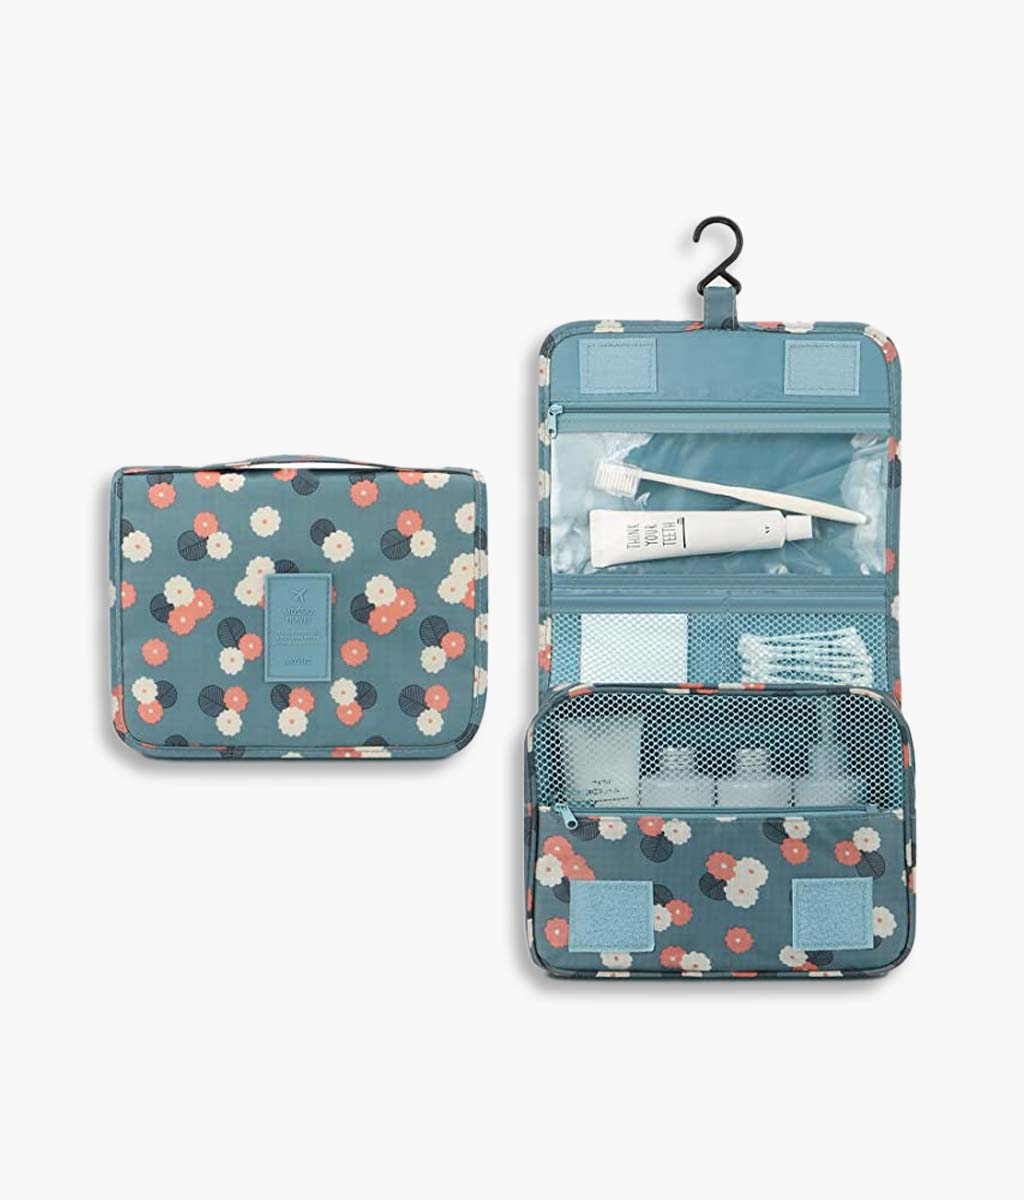 Hanging Toiletry Bag Cosmetic Makeup Travel Organizer